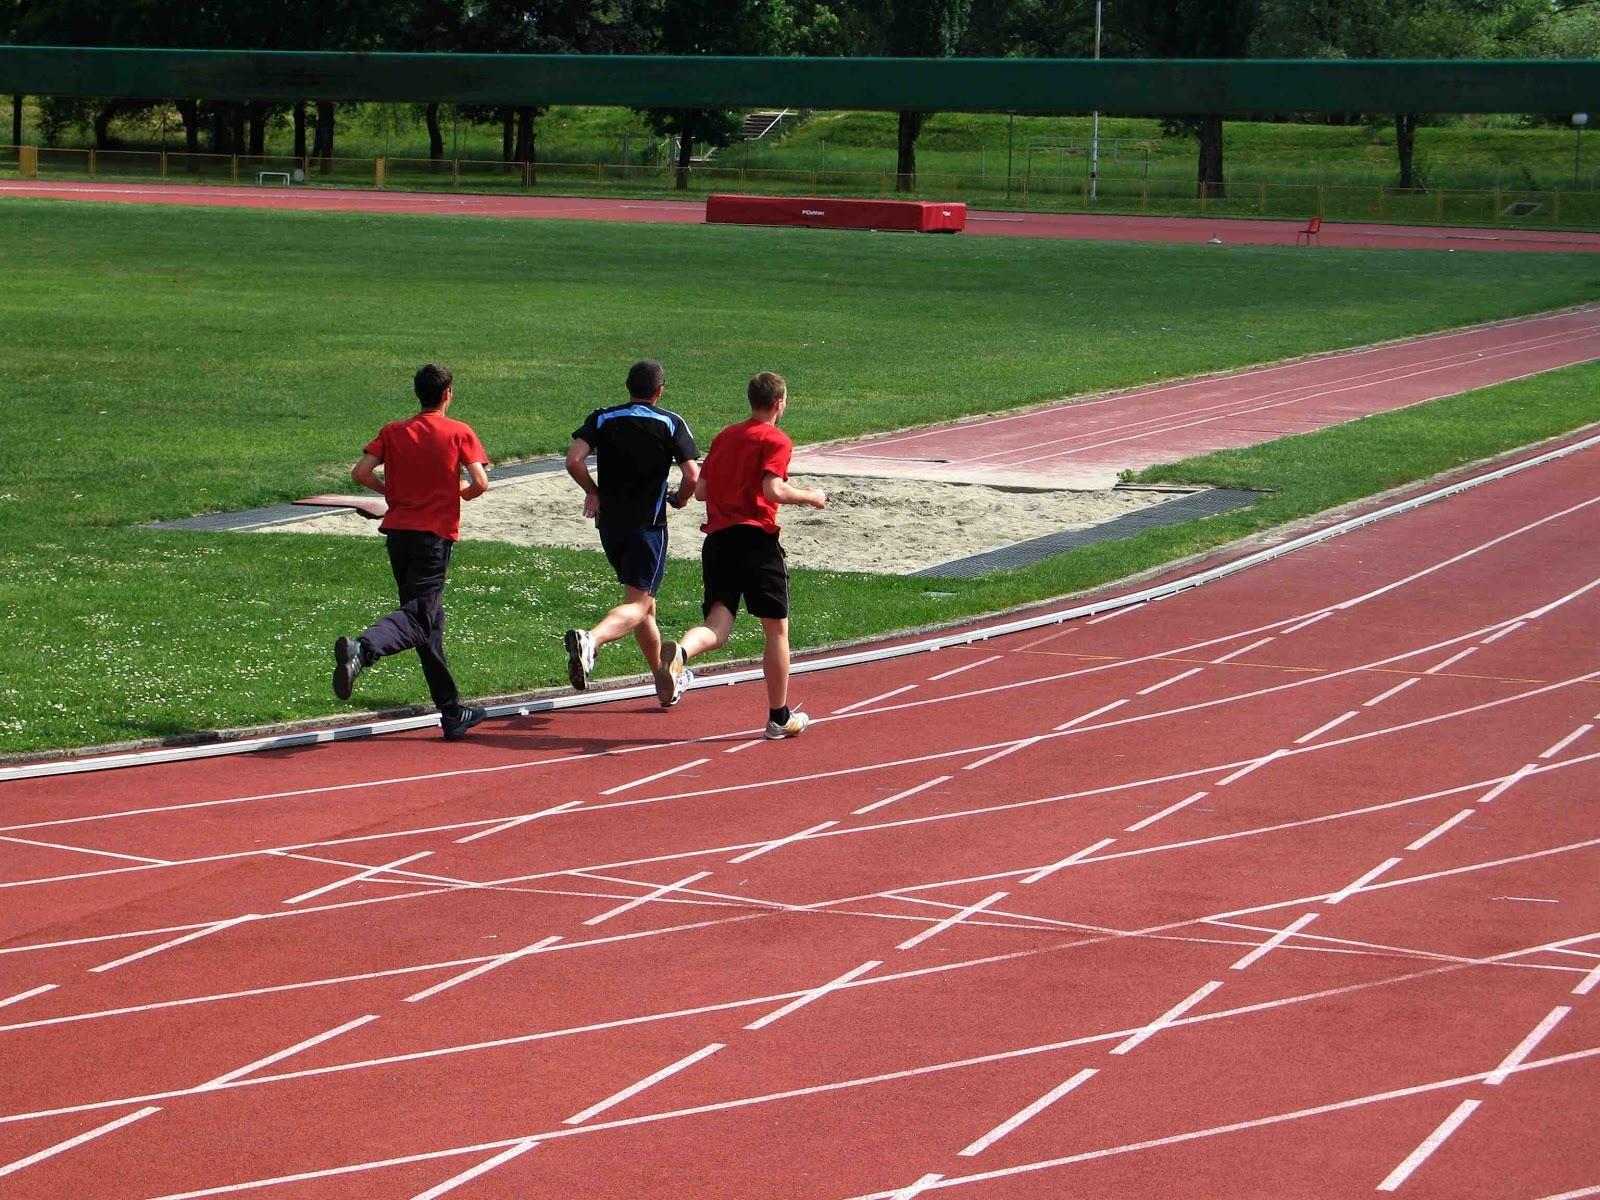 corredores, runners, corredors, pista, atletismo